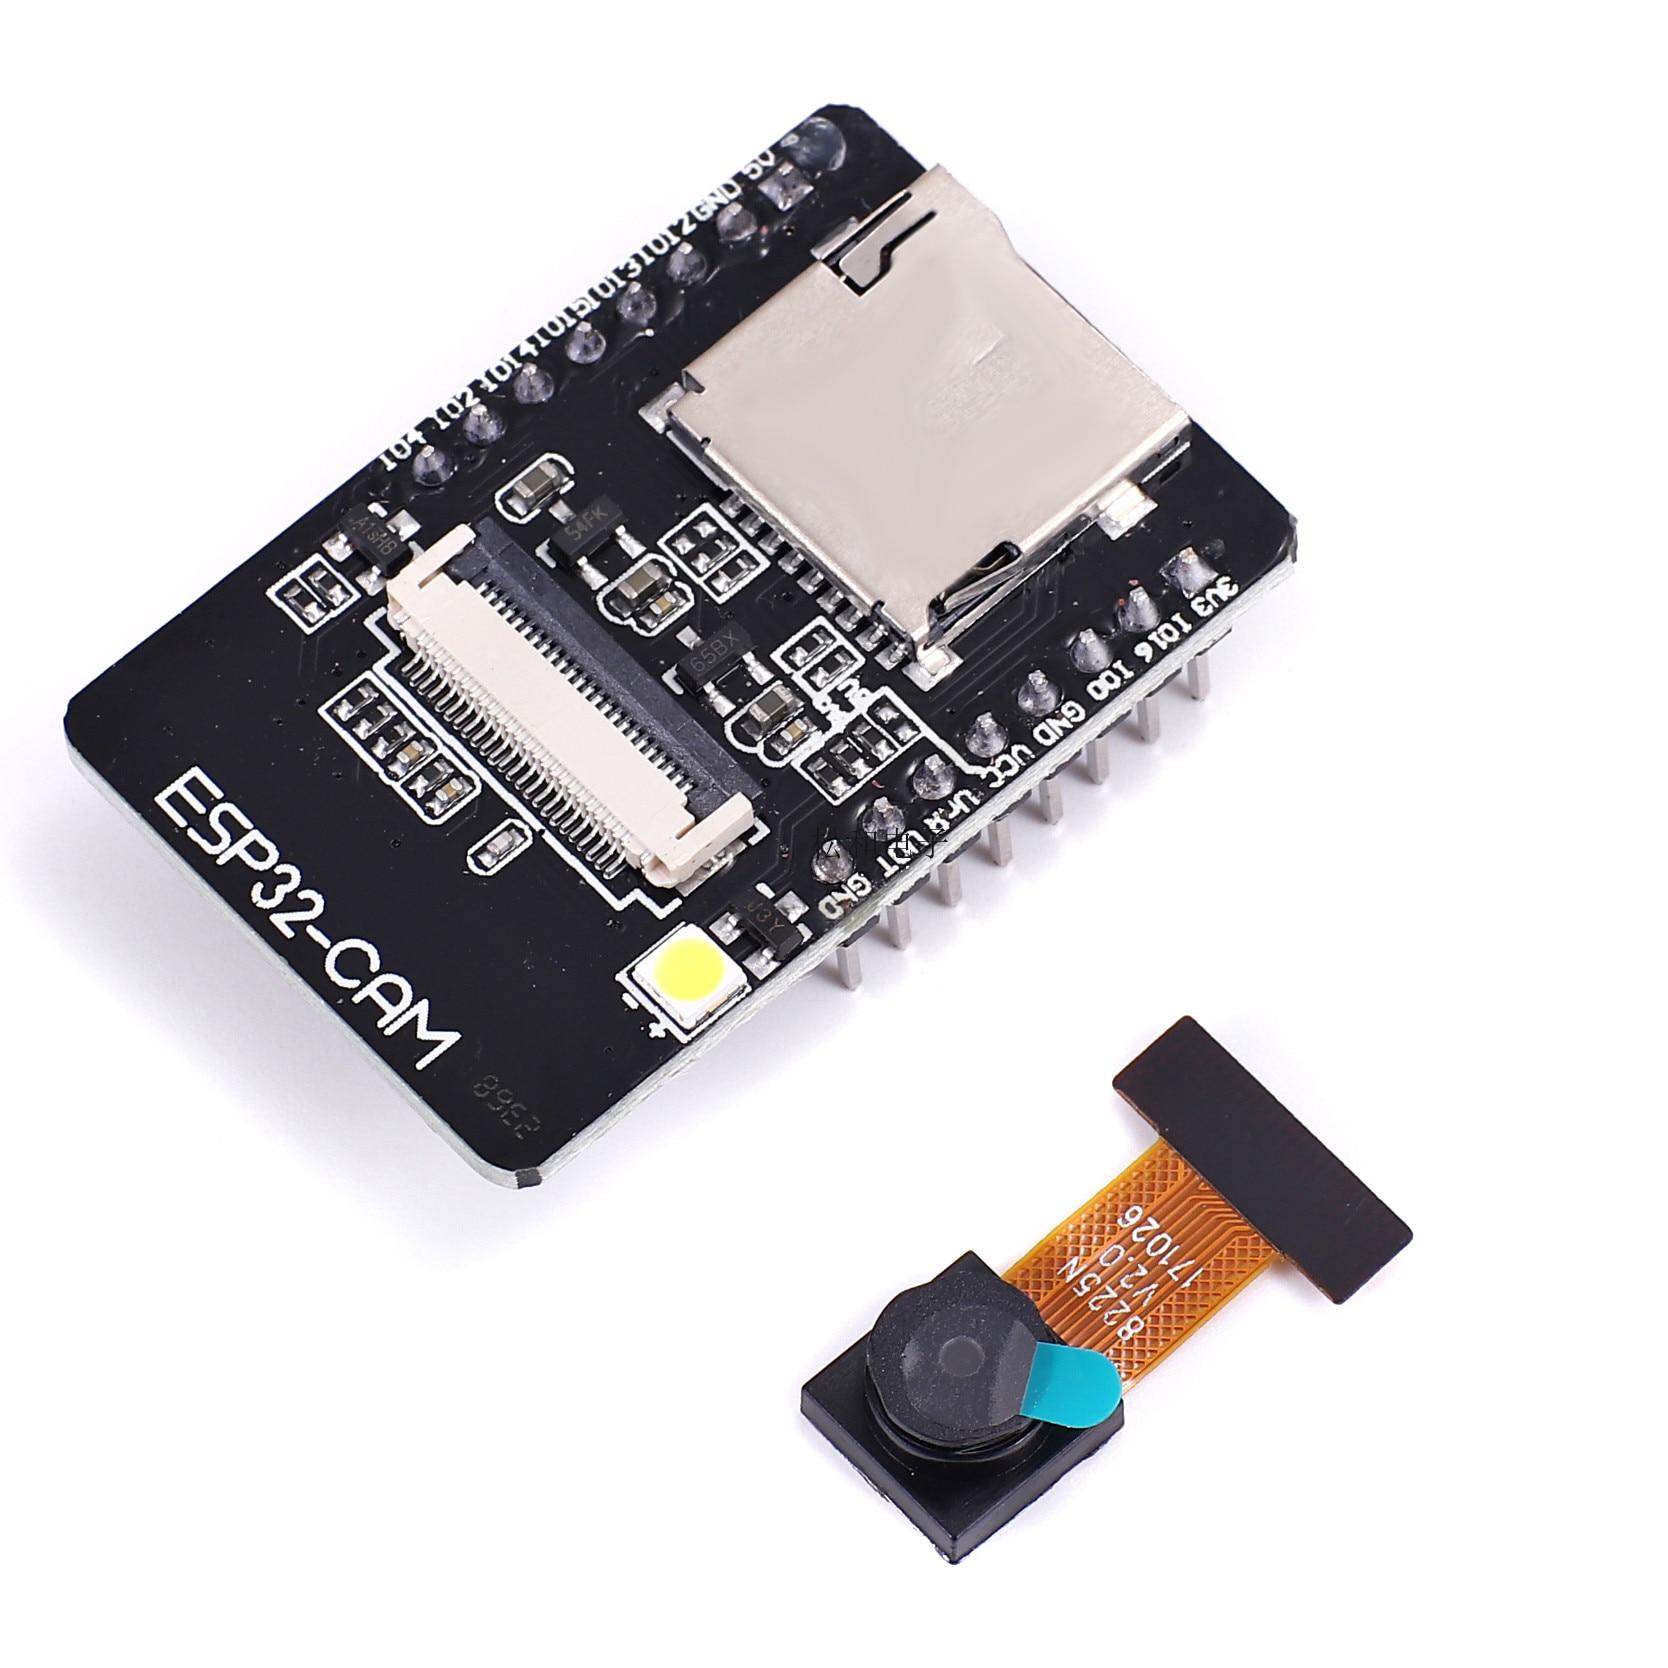 ESP32-CAM WiFi + Bluetooth модуль камеры, макетная плата ESP32 с модулем камеры OV2640 2MP